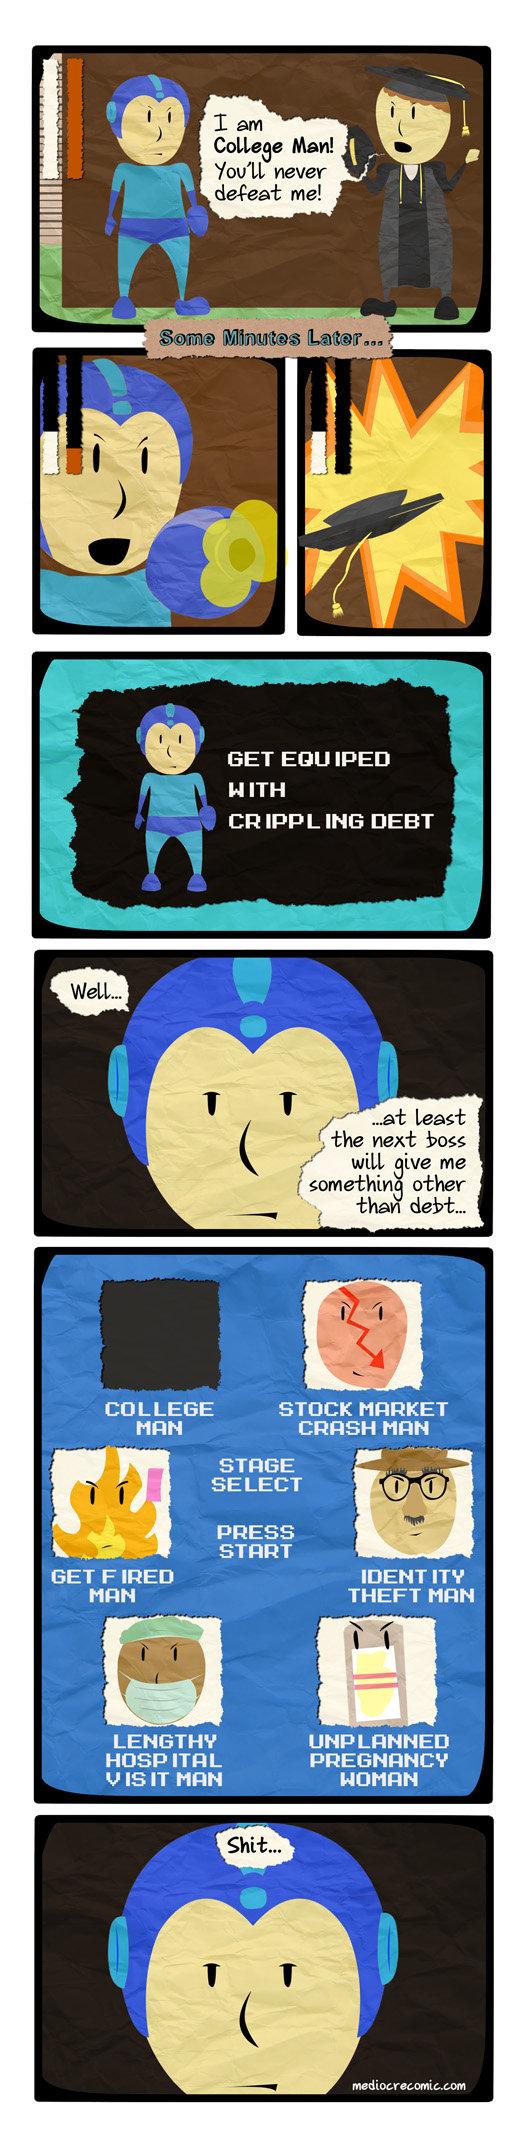 "Mega Man. . Elam never ill, GET IF' EEI CH IPP L ING DEBT 1: 116 next : lolit' l MR Elva me other dsotm f somethin mi, the STUCK Ill"" -IFFIER HRH SELECT lloll.,"